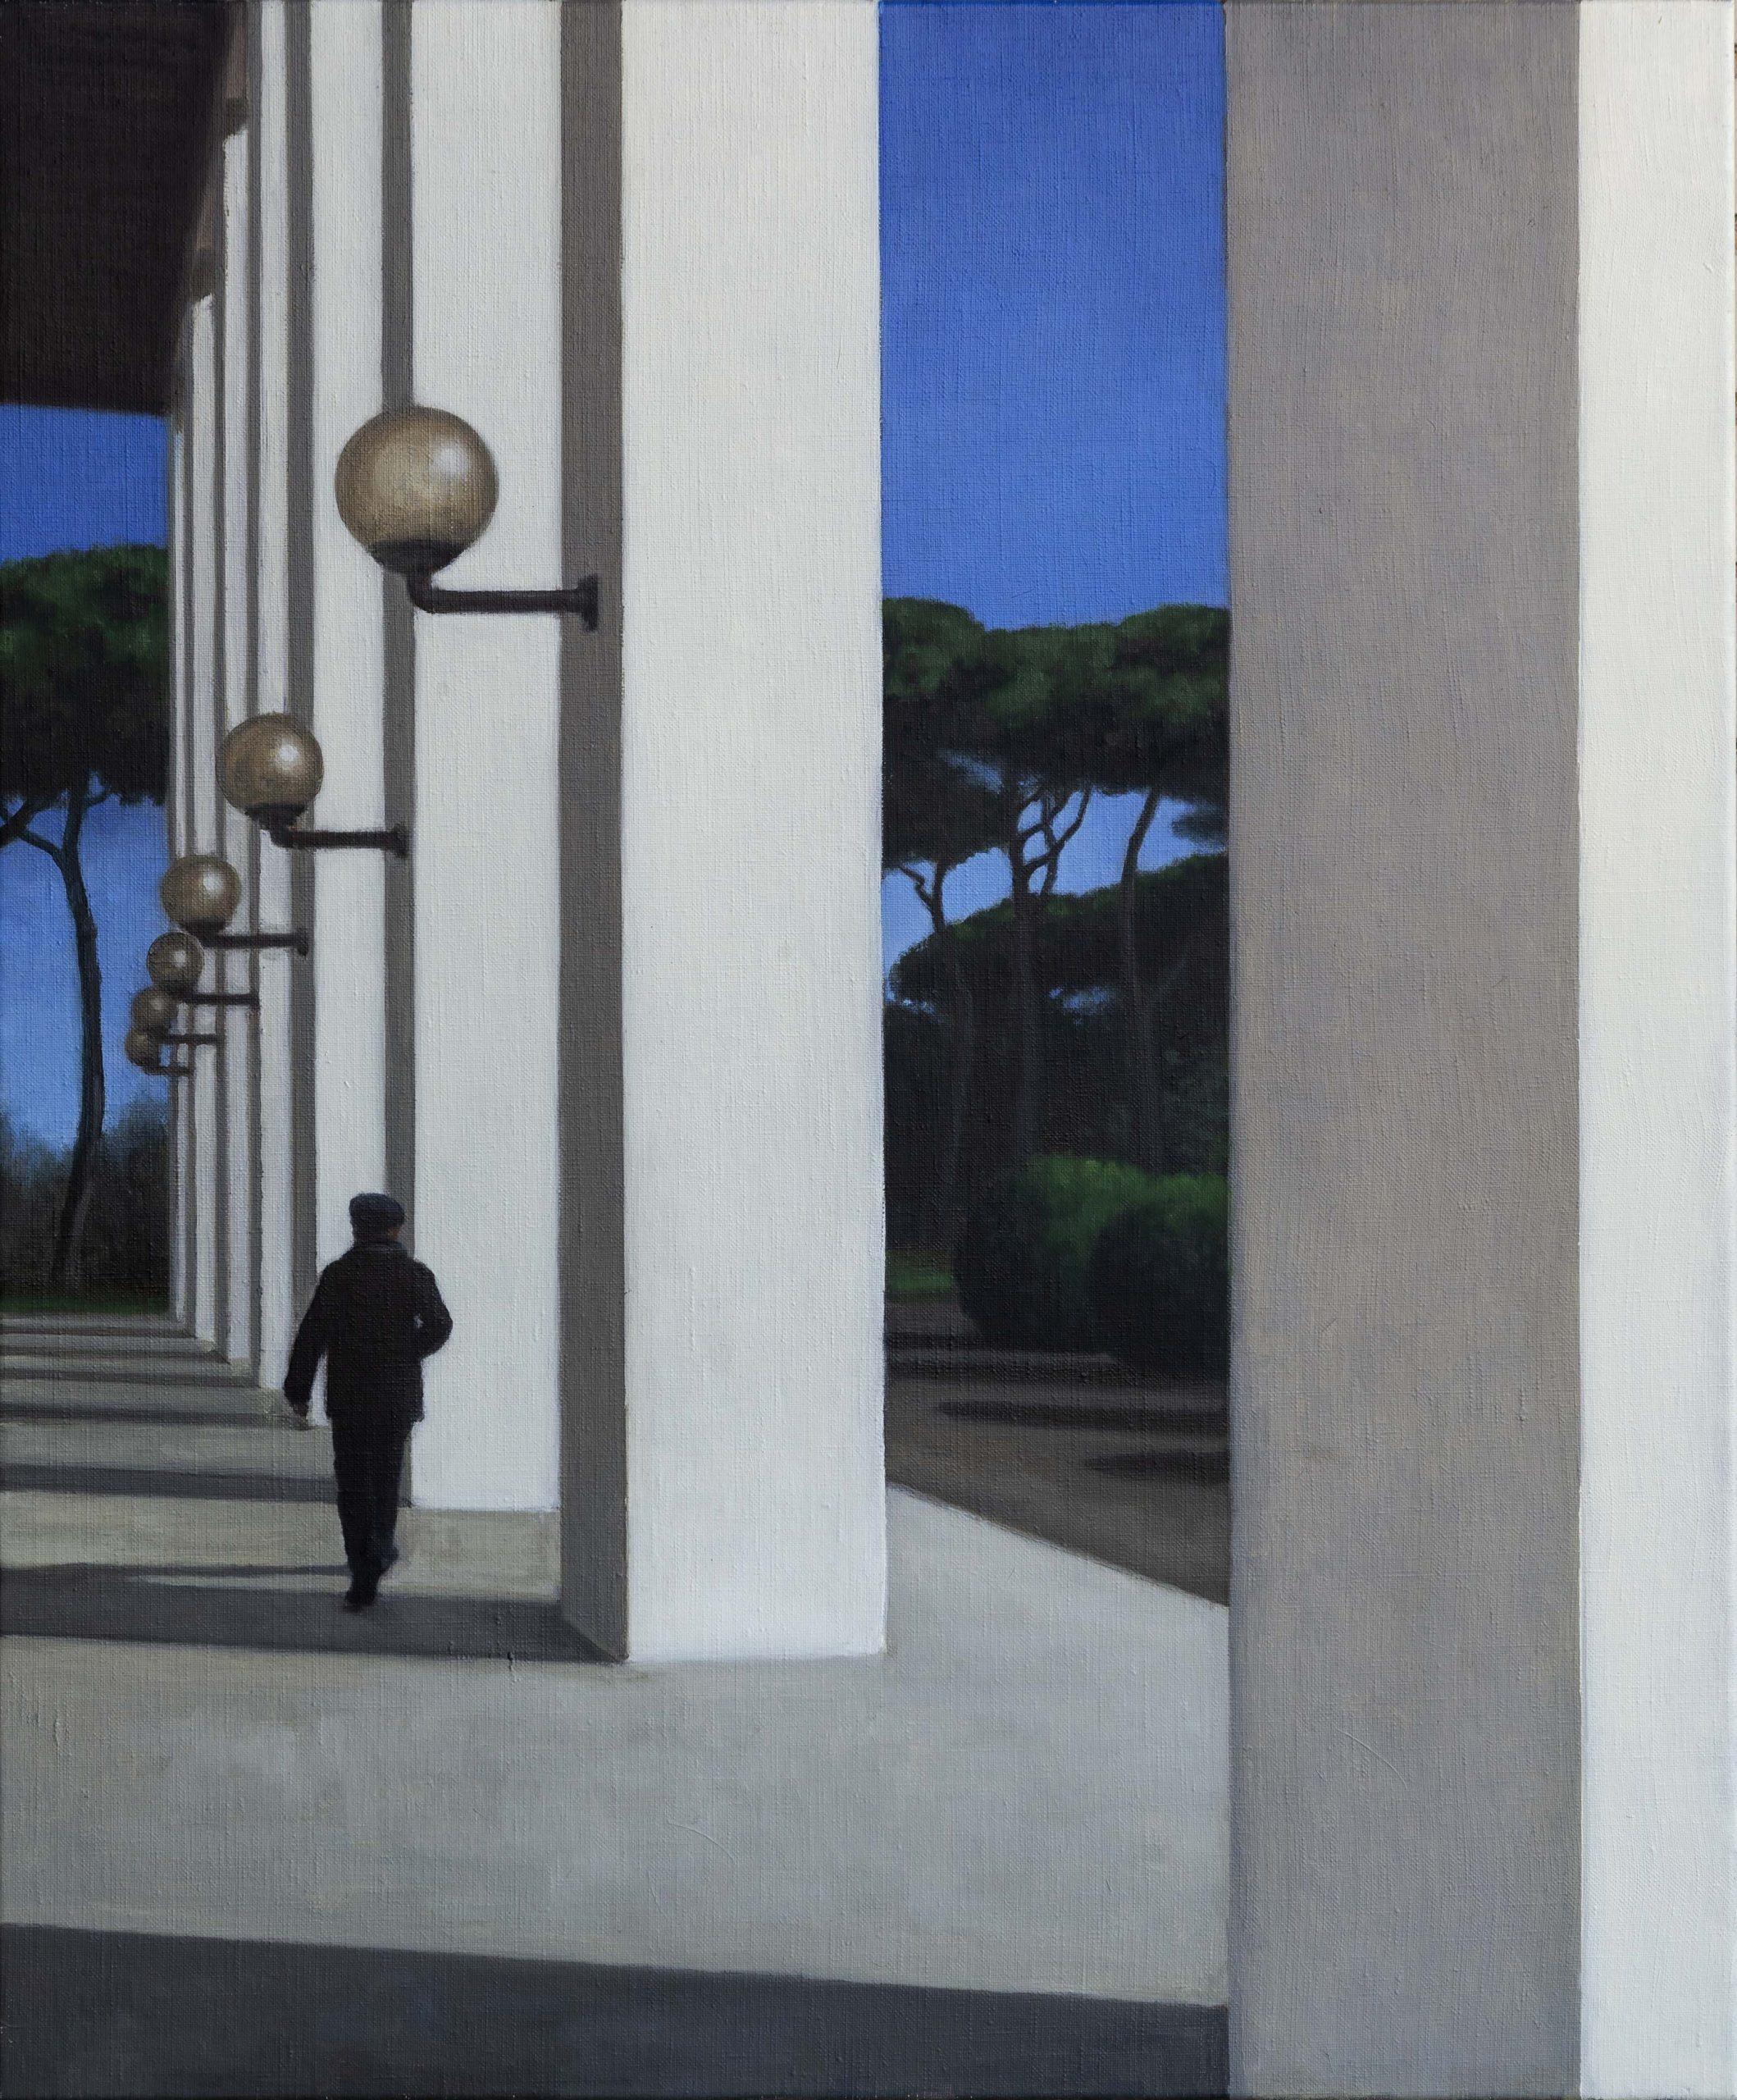 F-07 Historiador del arte en el EUR Óleo sobre lienzo 73 x 60 cm 2020